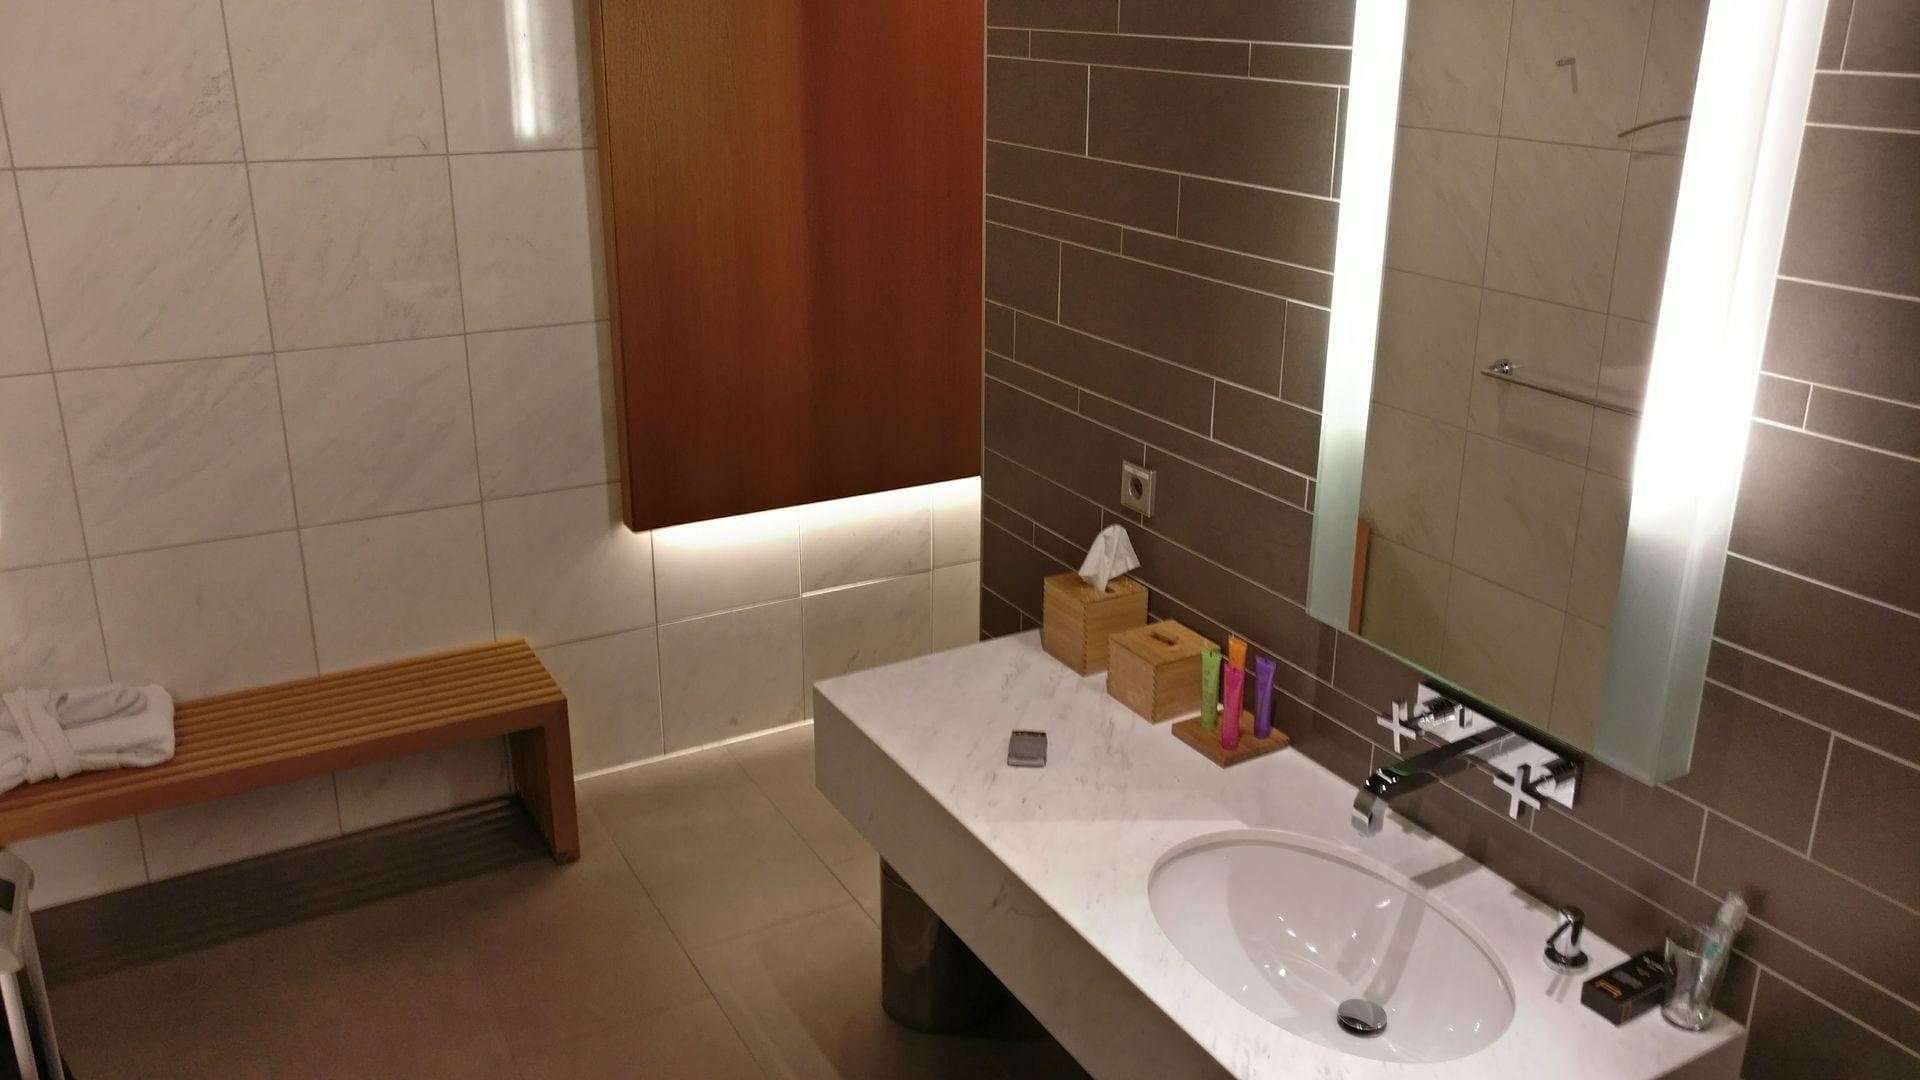 lufthansa first class terminal frankfurt bad dusche. Black Bedroom Furniture Sets. Home Design Ideas